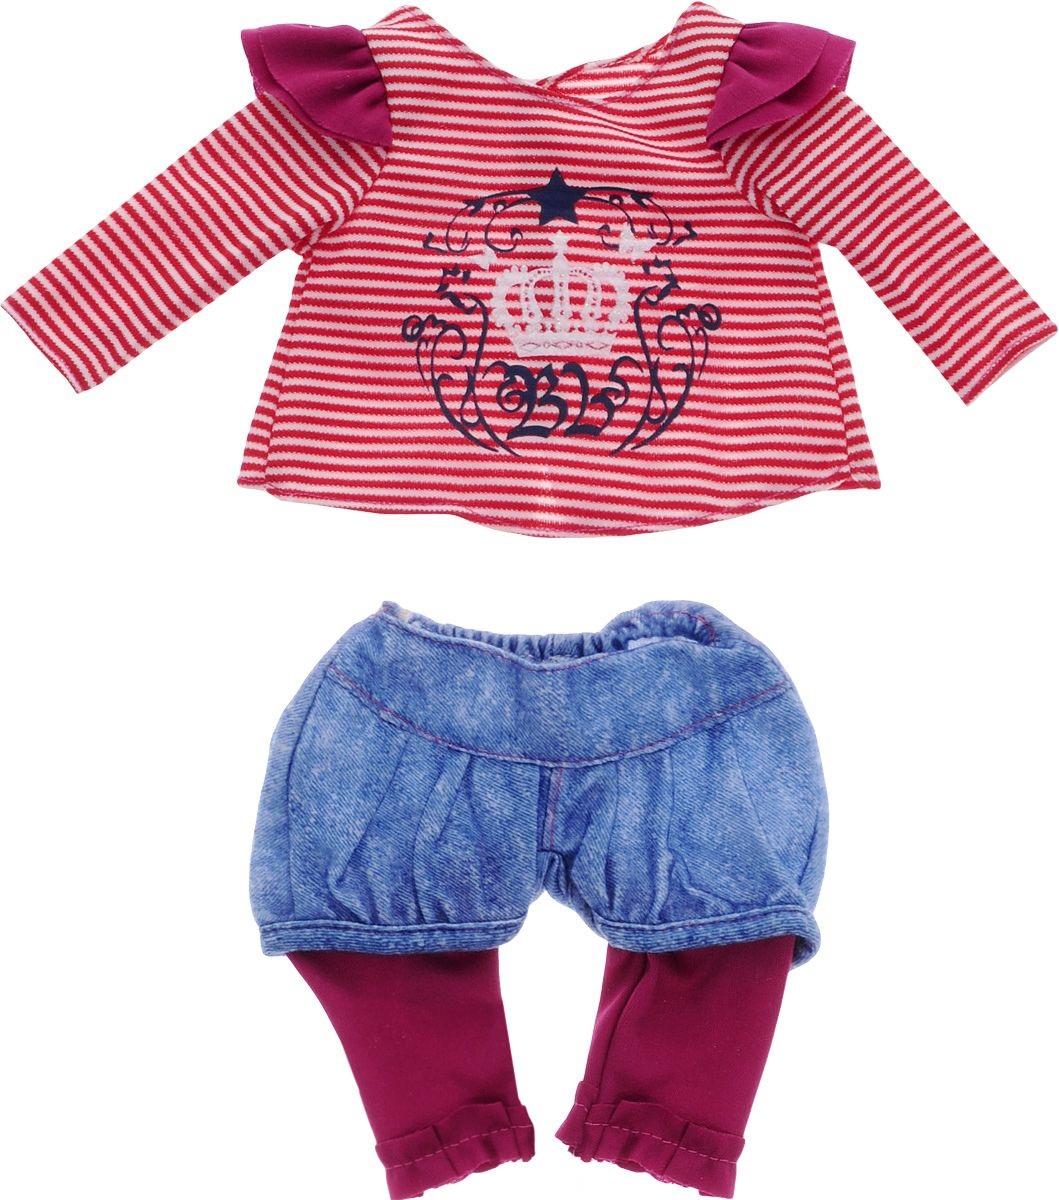 Одежда для кукол: кофточка и штаныОдежда для кукол<br>Одежда для кукол: кофточка и штаны<br>